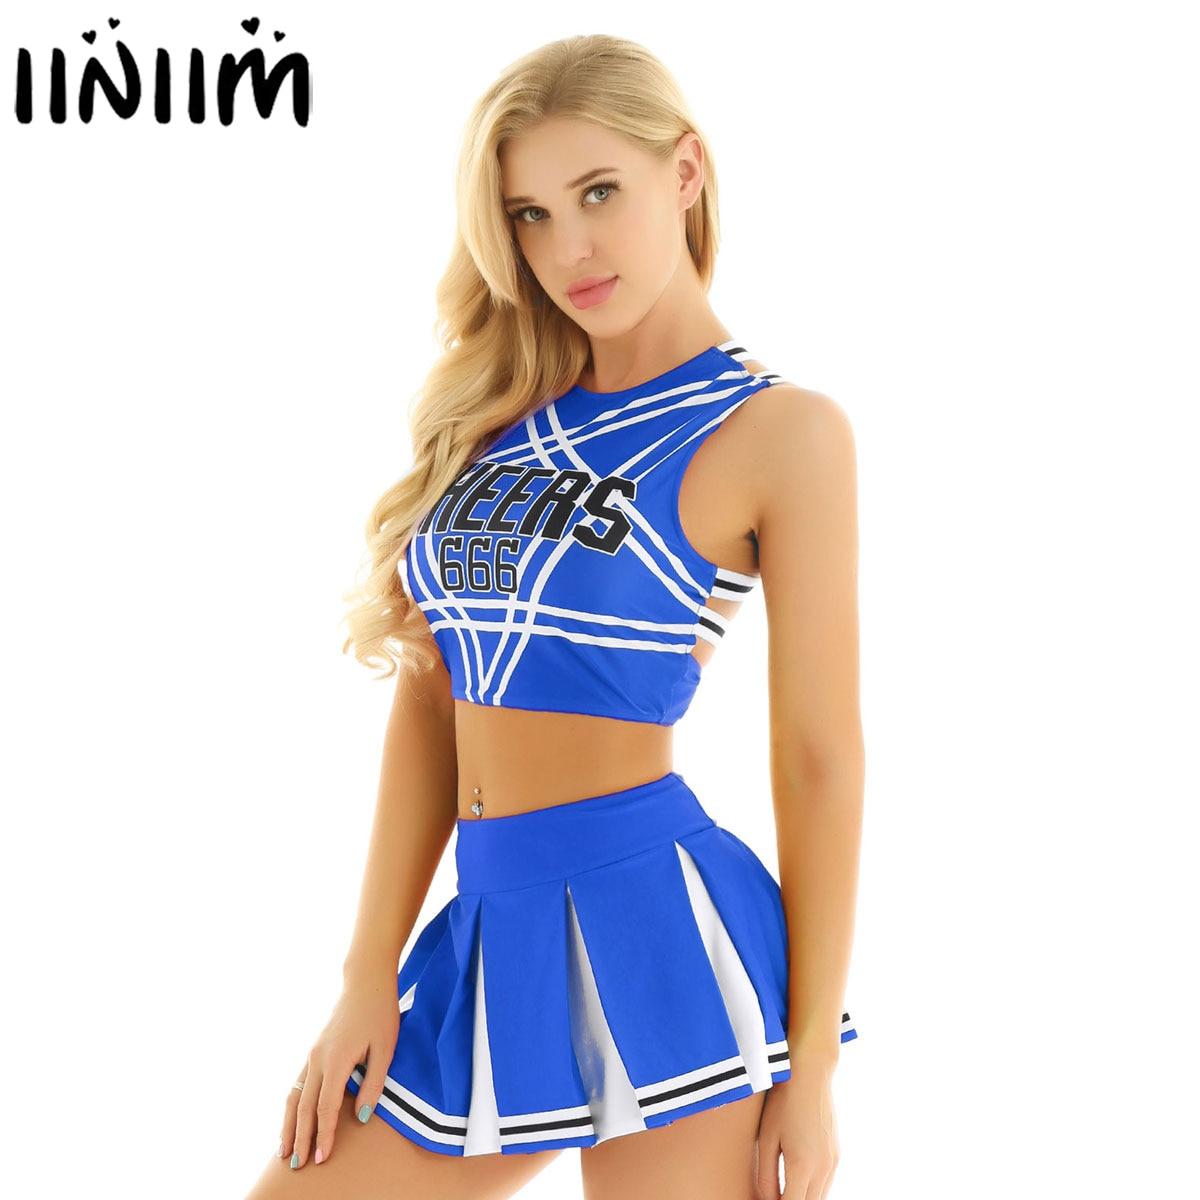 Women Adult Cheerleader Mini Pleated Skirt Costume Set Sexy Japan/Korean School Girls Cosplay Uniforms Halloween Fancy Clothing